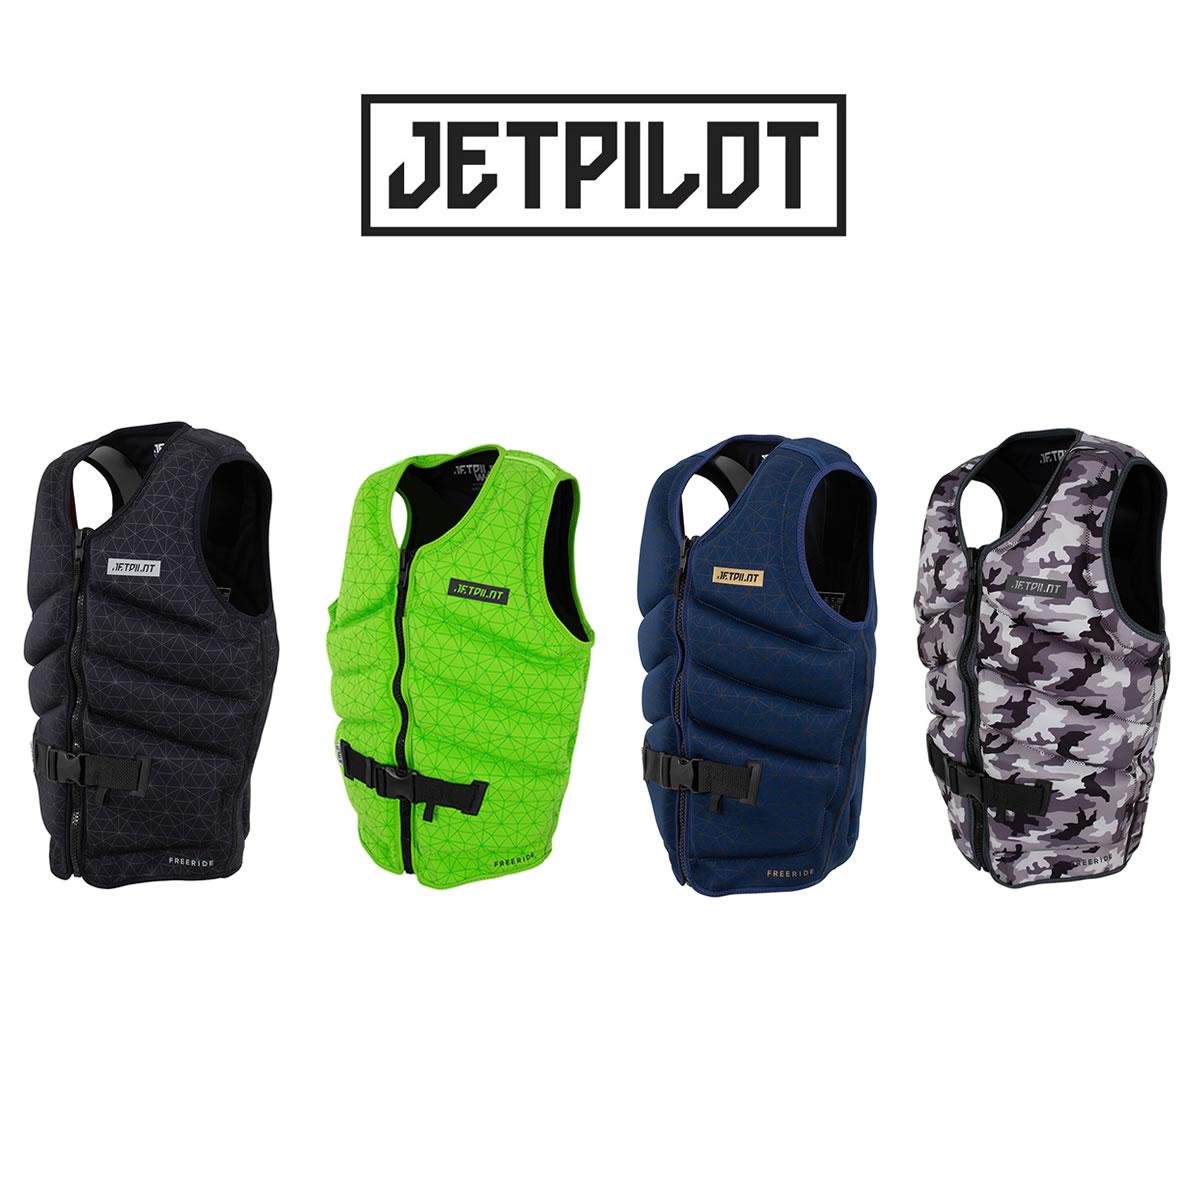 JETPILOT(ジェットパイロット)ネオベスト フリーライドF/Eネオベスト(JA20228)